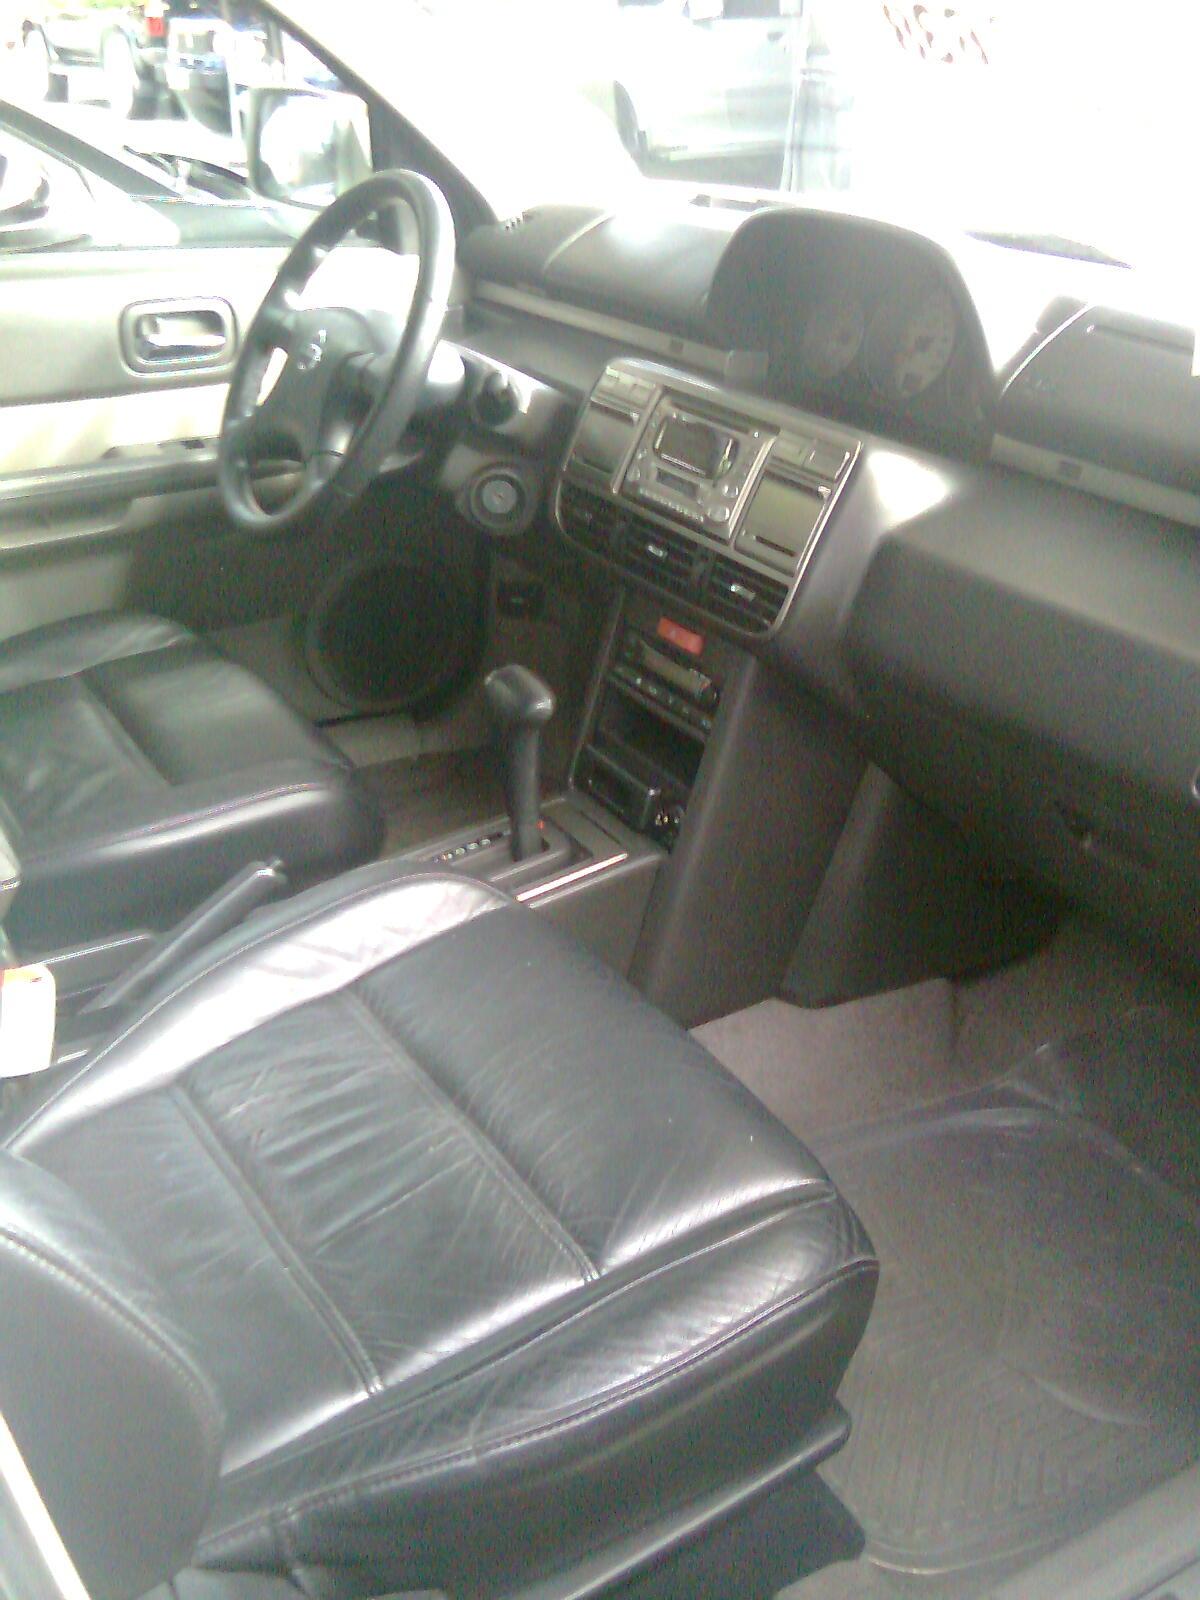 1 New DTA Rear Wheel Bearing Unit Fits 1996-2000 Toyota RAV-4 AWD Model Only